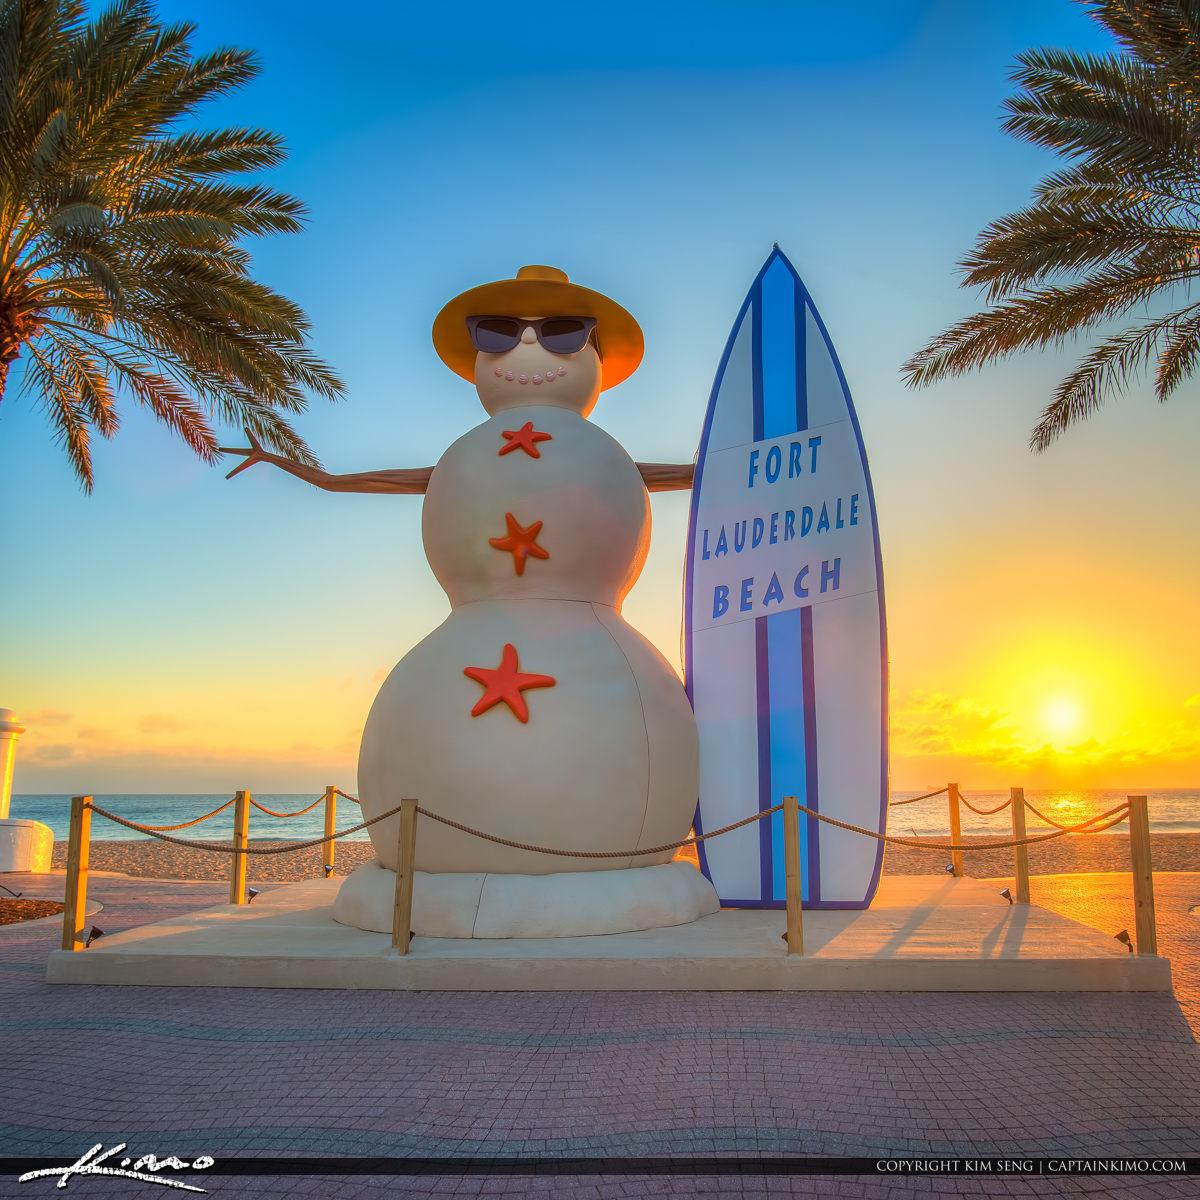 Snowman At Fort Lauderdale Beach Sunrise At Las Olas Blvd